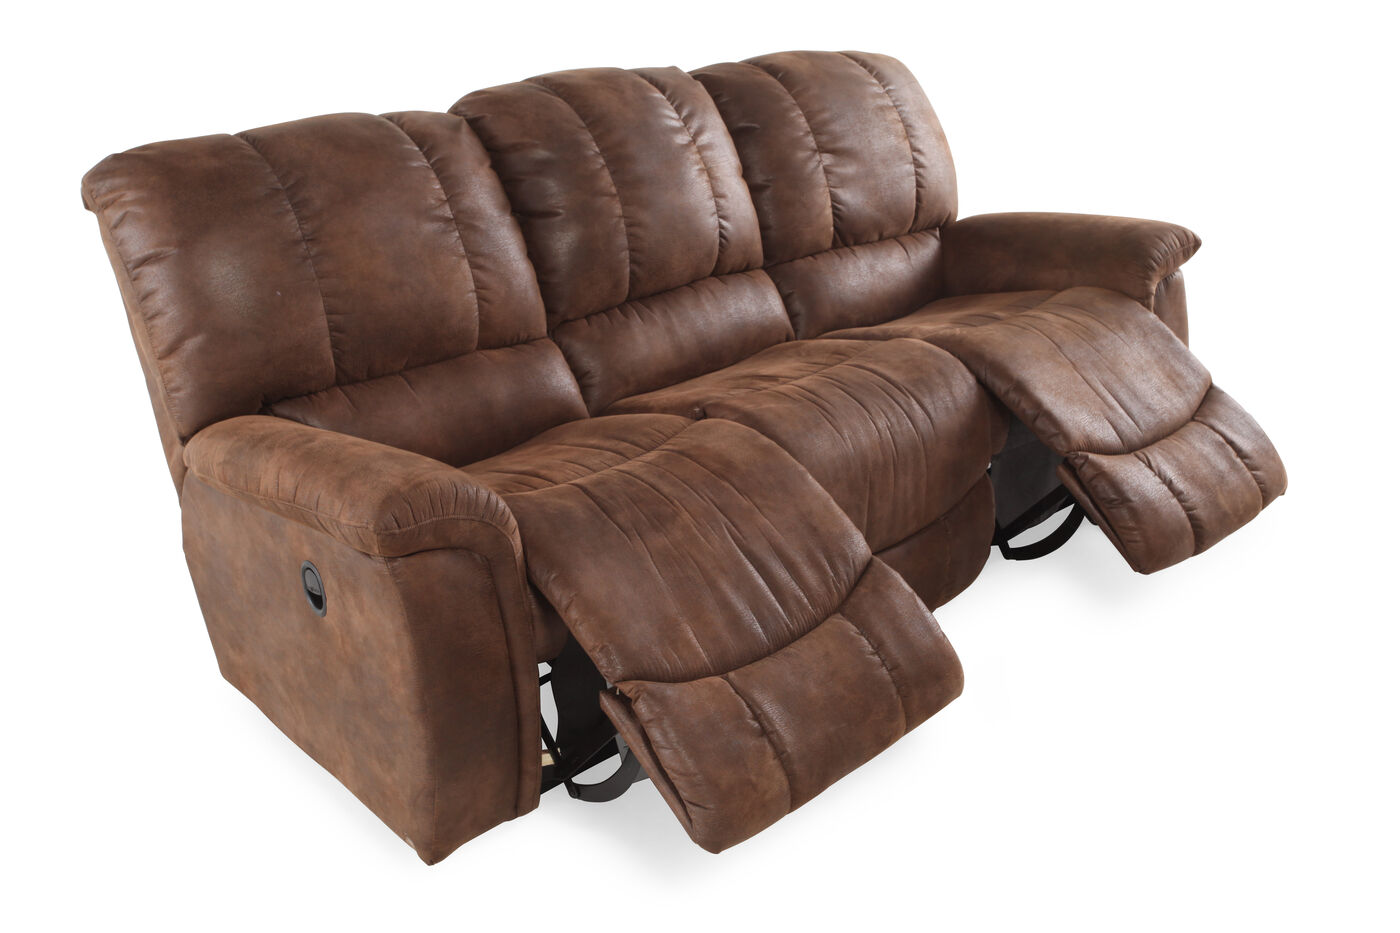 Lazyboy Recliner Sofa James La Z Time Full Reclining Sofa Thesofa